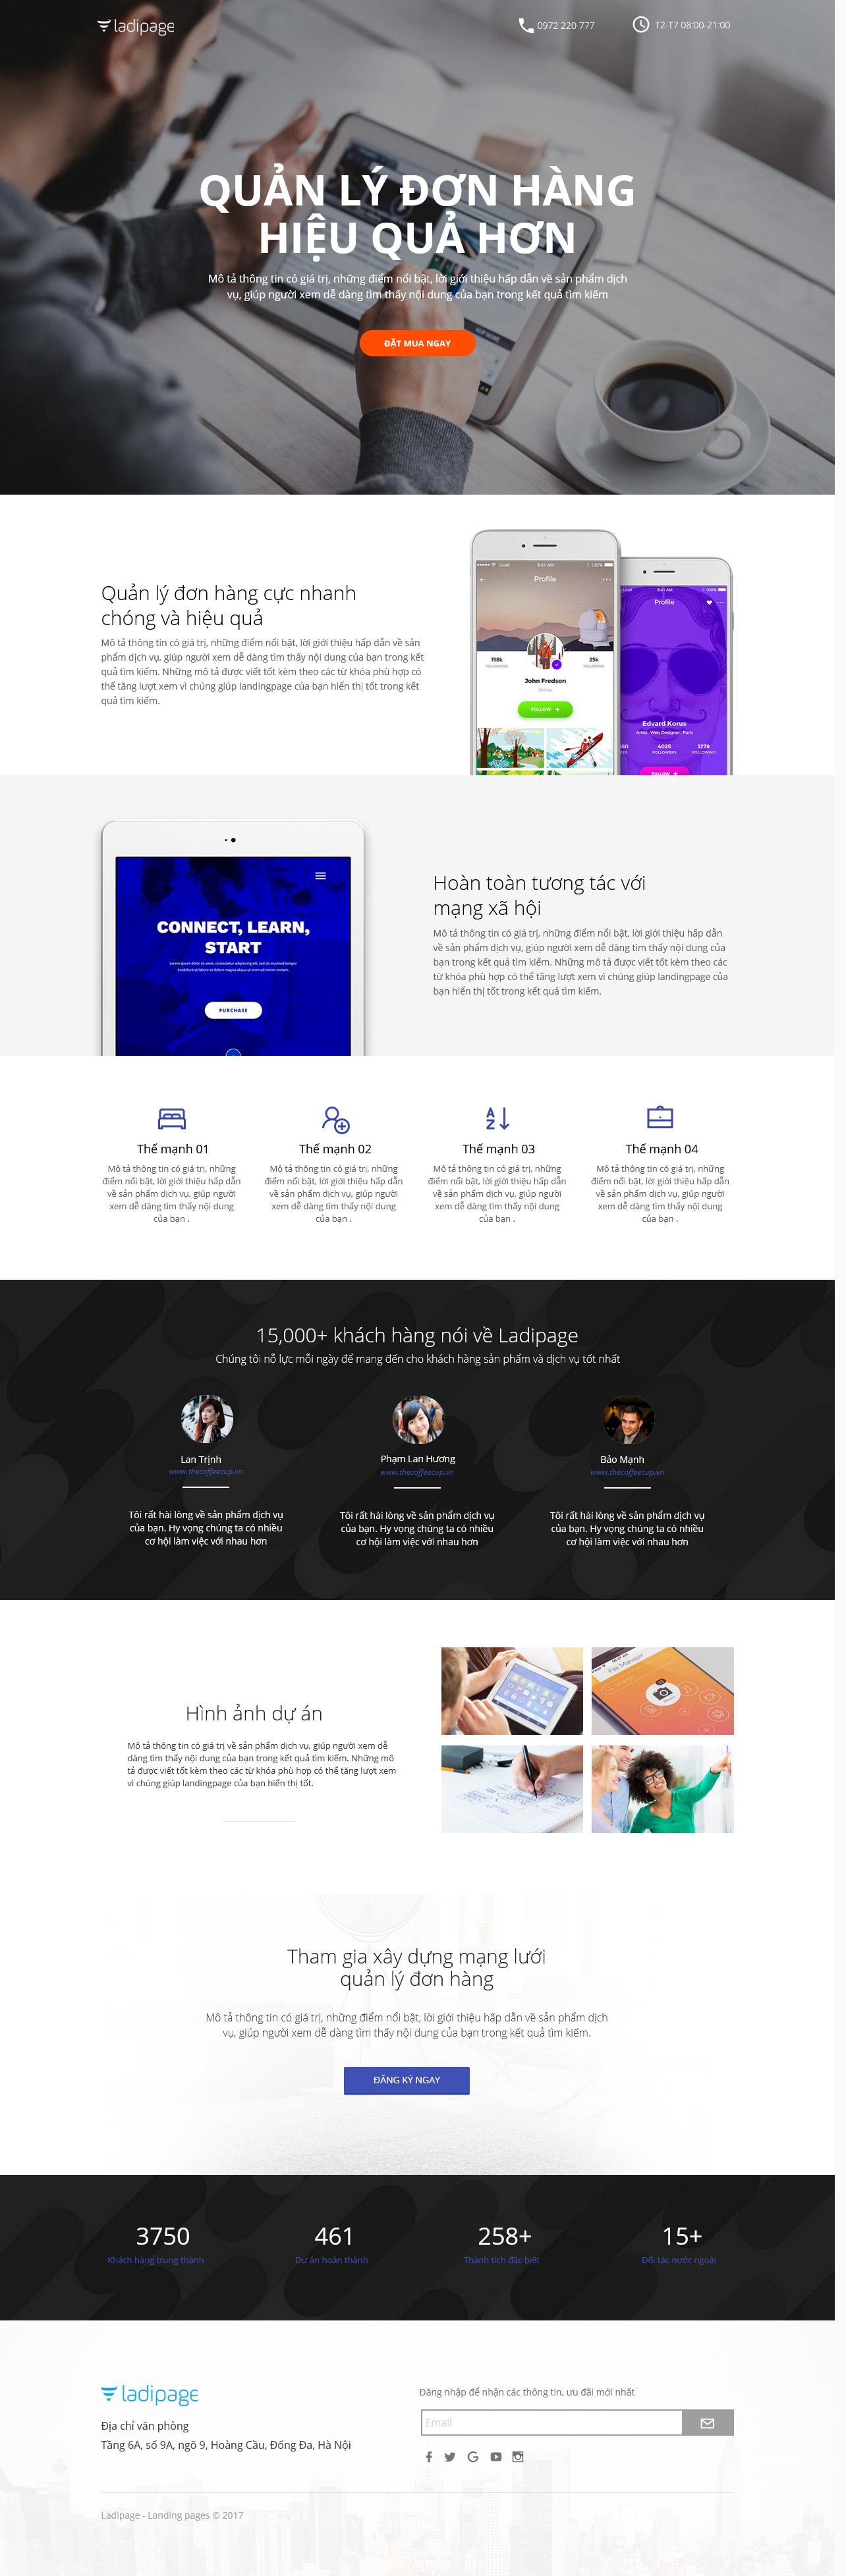 Thiết kế website Thiết kế webiste landingpage phan-mem---game---app Công nghệ 06